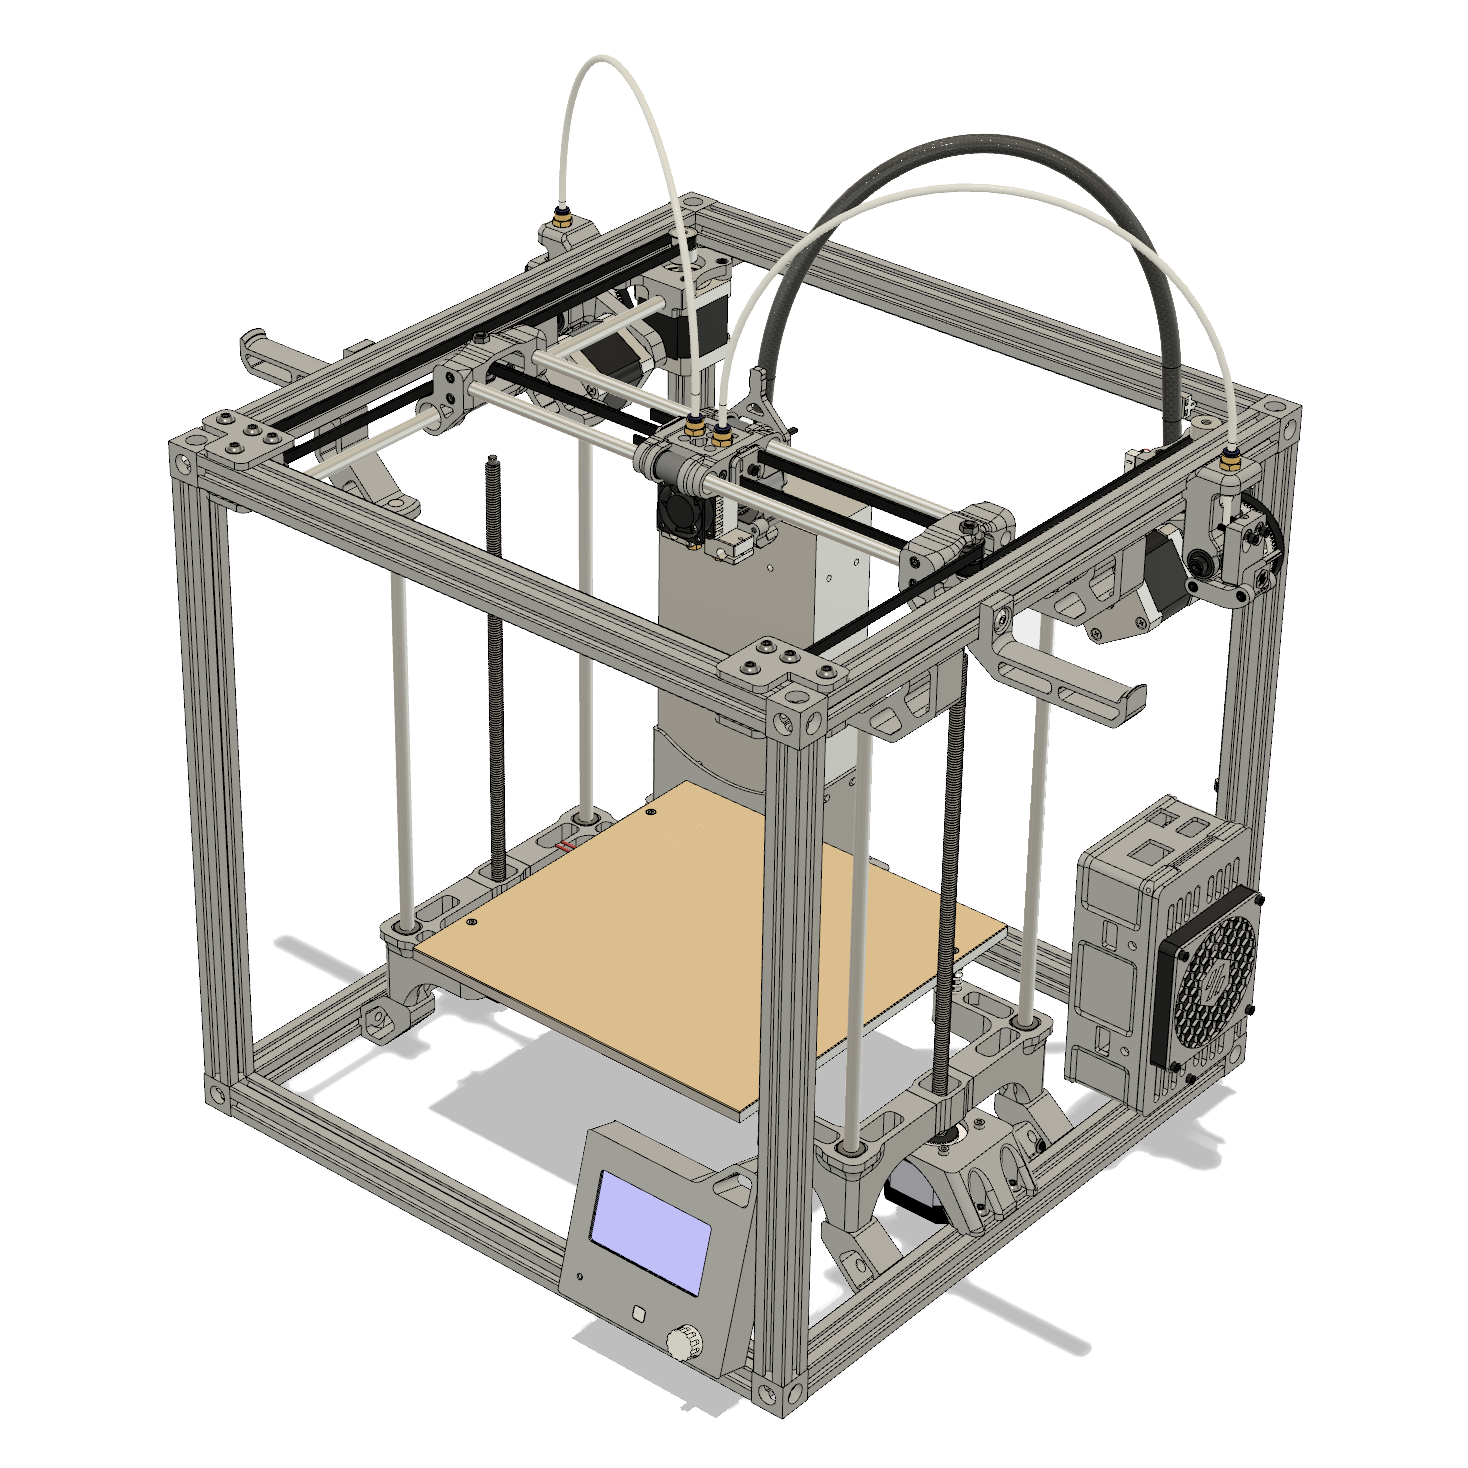 Cheap 3d Printers Under 250 Usd February 2021 3d Printing Cheap 3d Printer 3d Printer Machine 3d Printer Kit